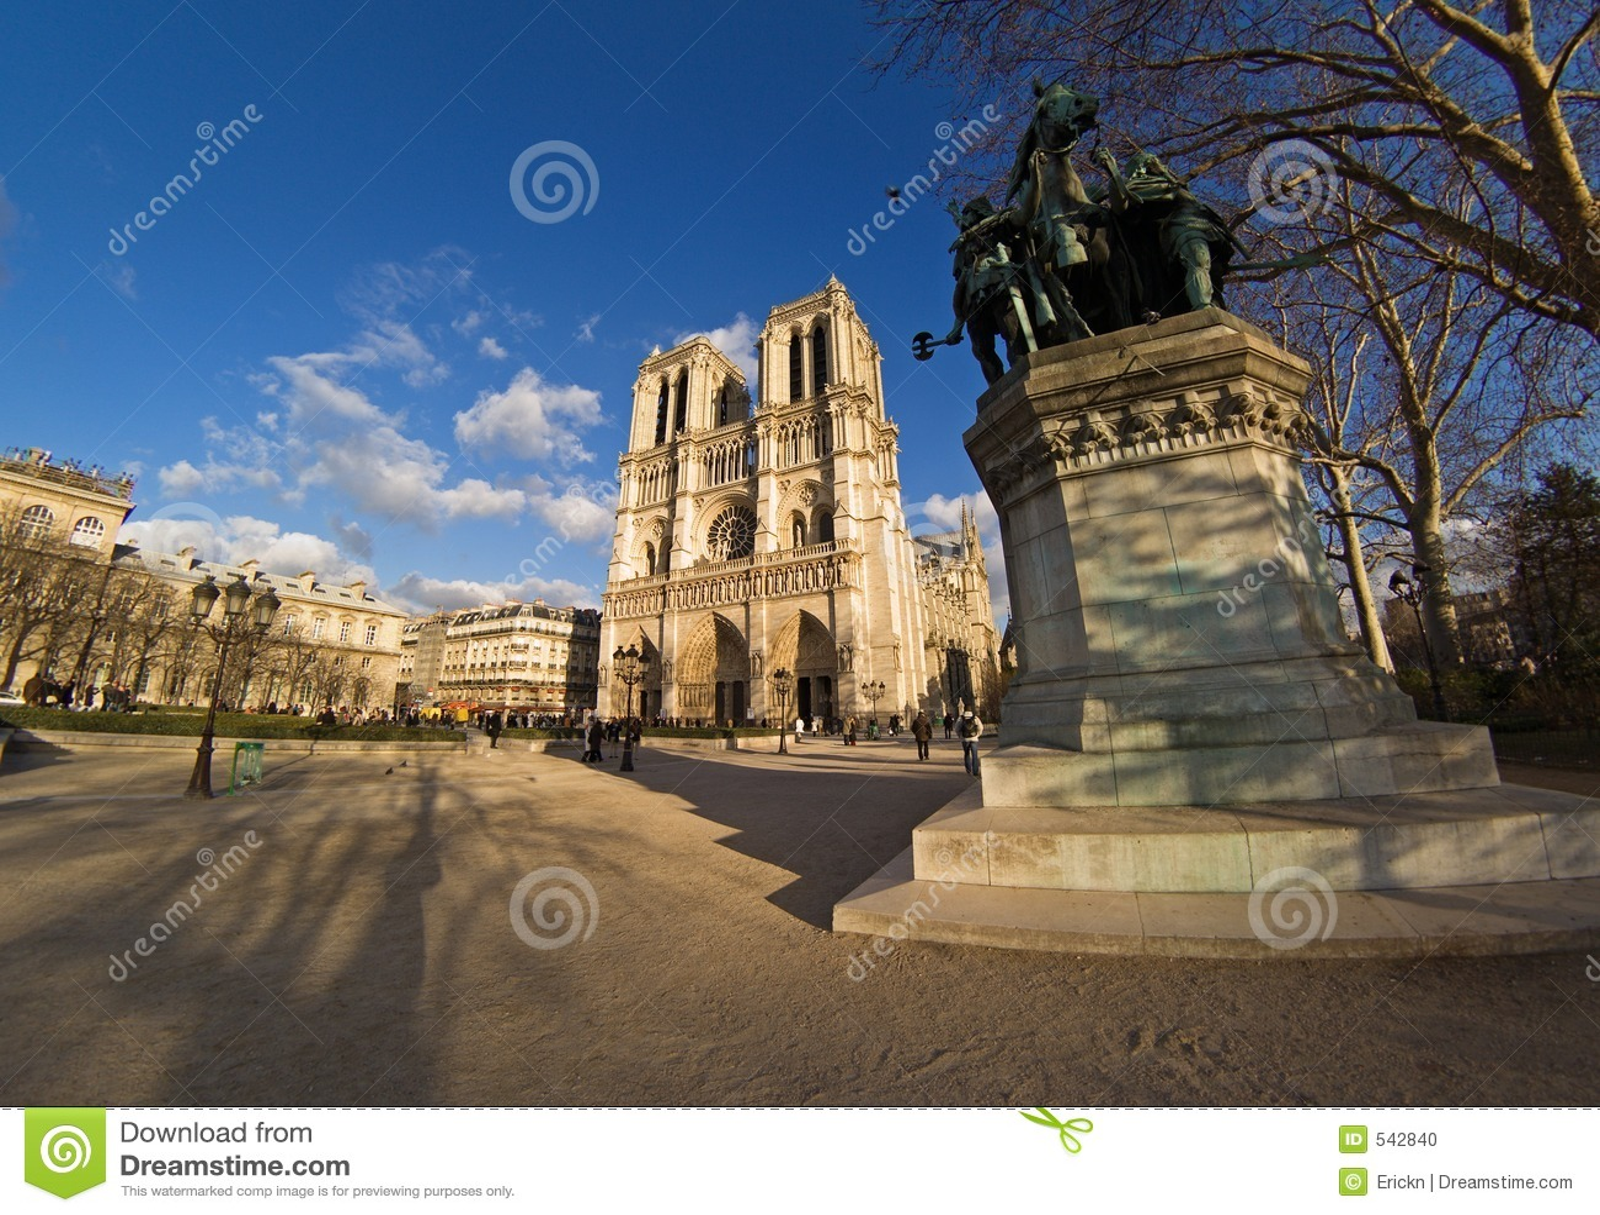 Download De notre巴黎贵妇人 库存照片. 图片 包括有 地标, 祷告, 教会, 都市, notre, 旅游业, 法国 - 542840